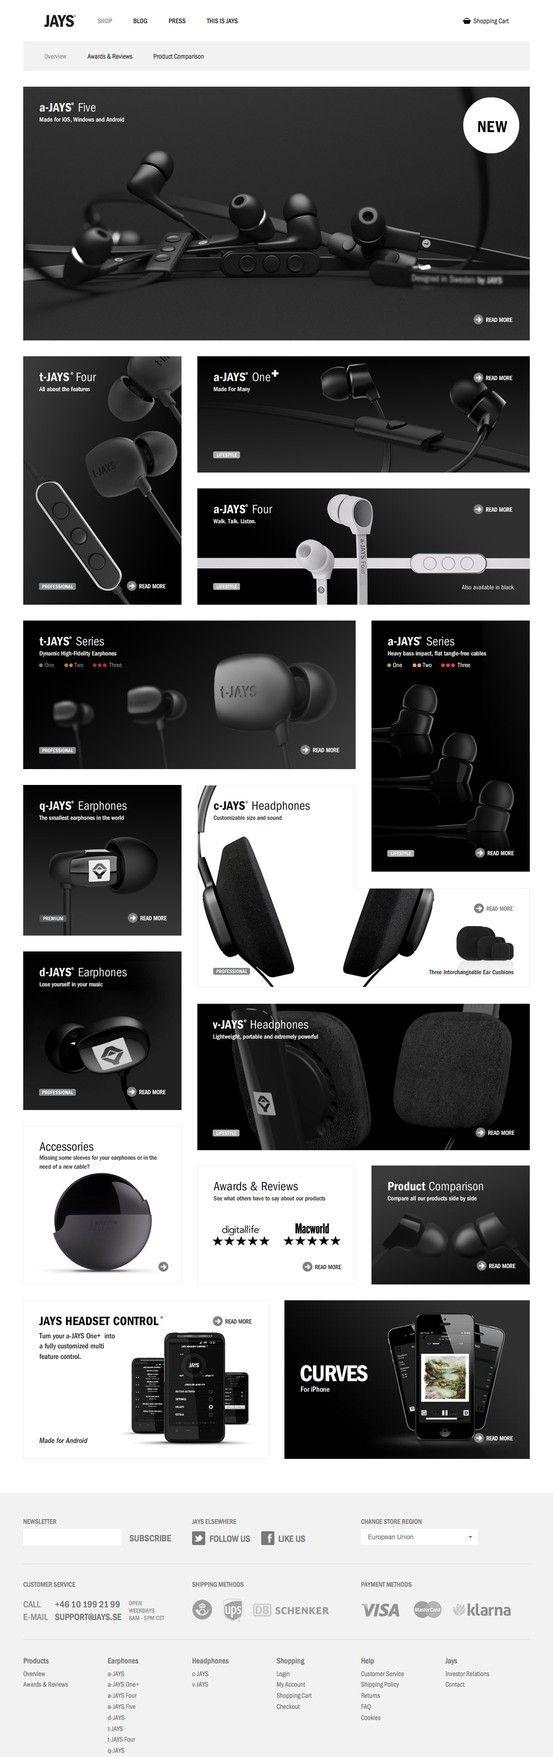 Web Design Jays Shop | #webdesign #it #web #design #layout #userinterface #website #webdesign < repinned by www.BlickeDeeler.de | Take a look at www.WebsiteDesign-Hamburg.de